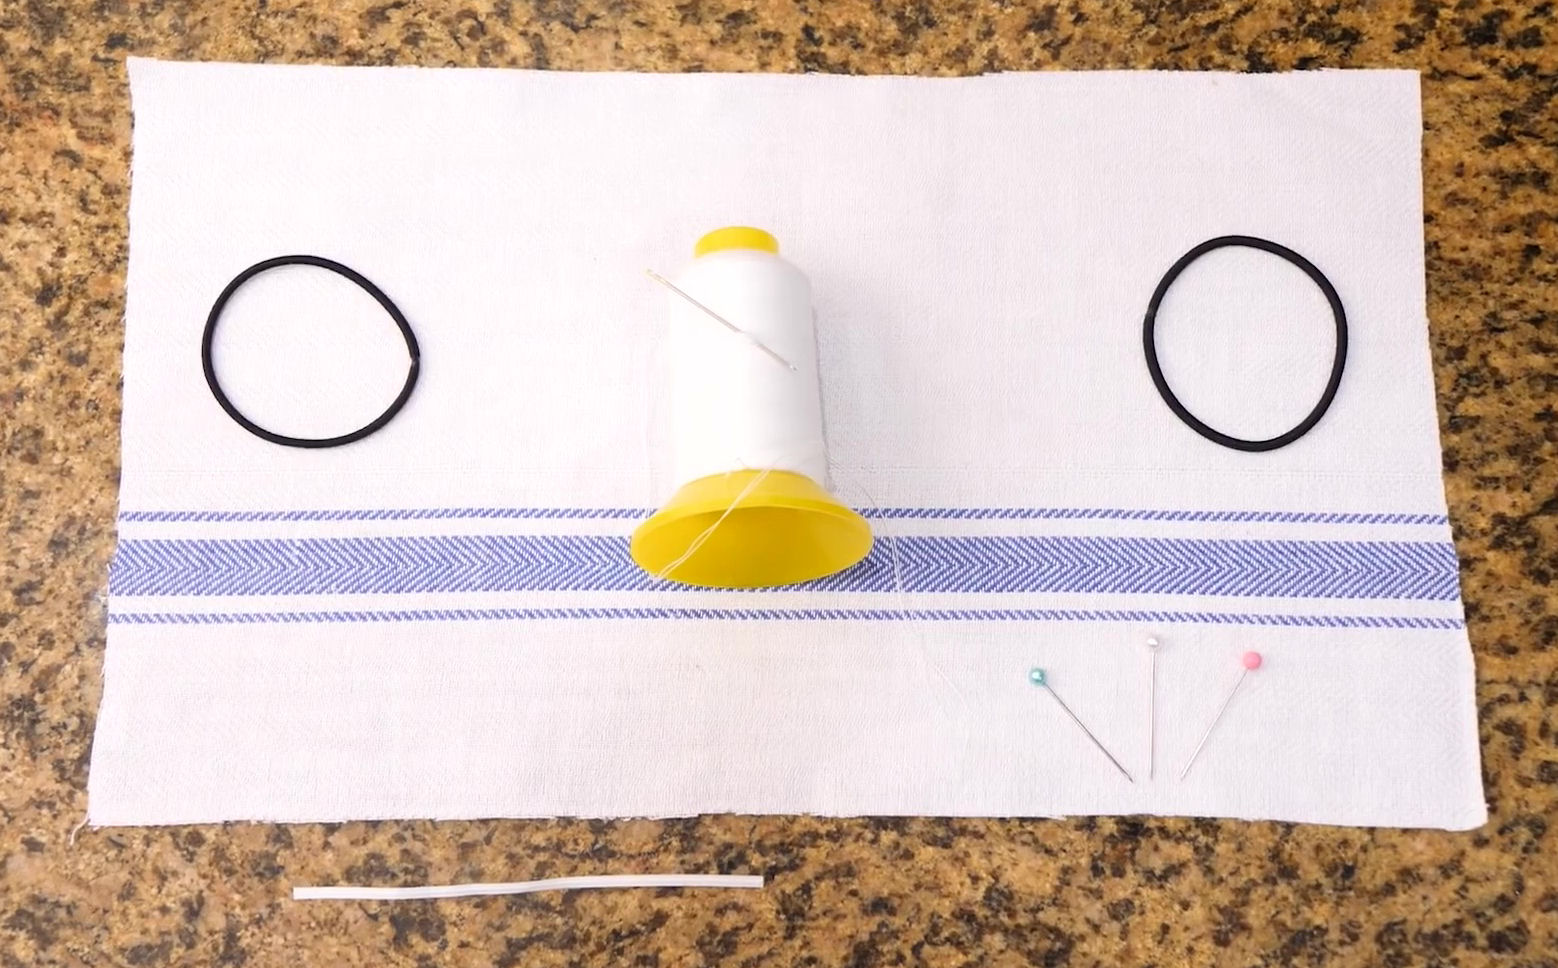 cubrebocas coronavirus confeccionar coser tela